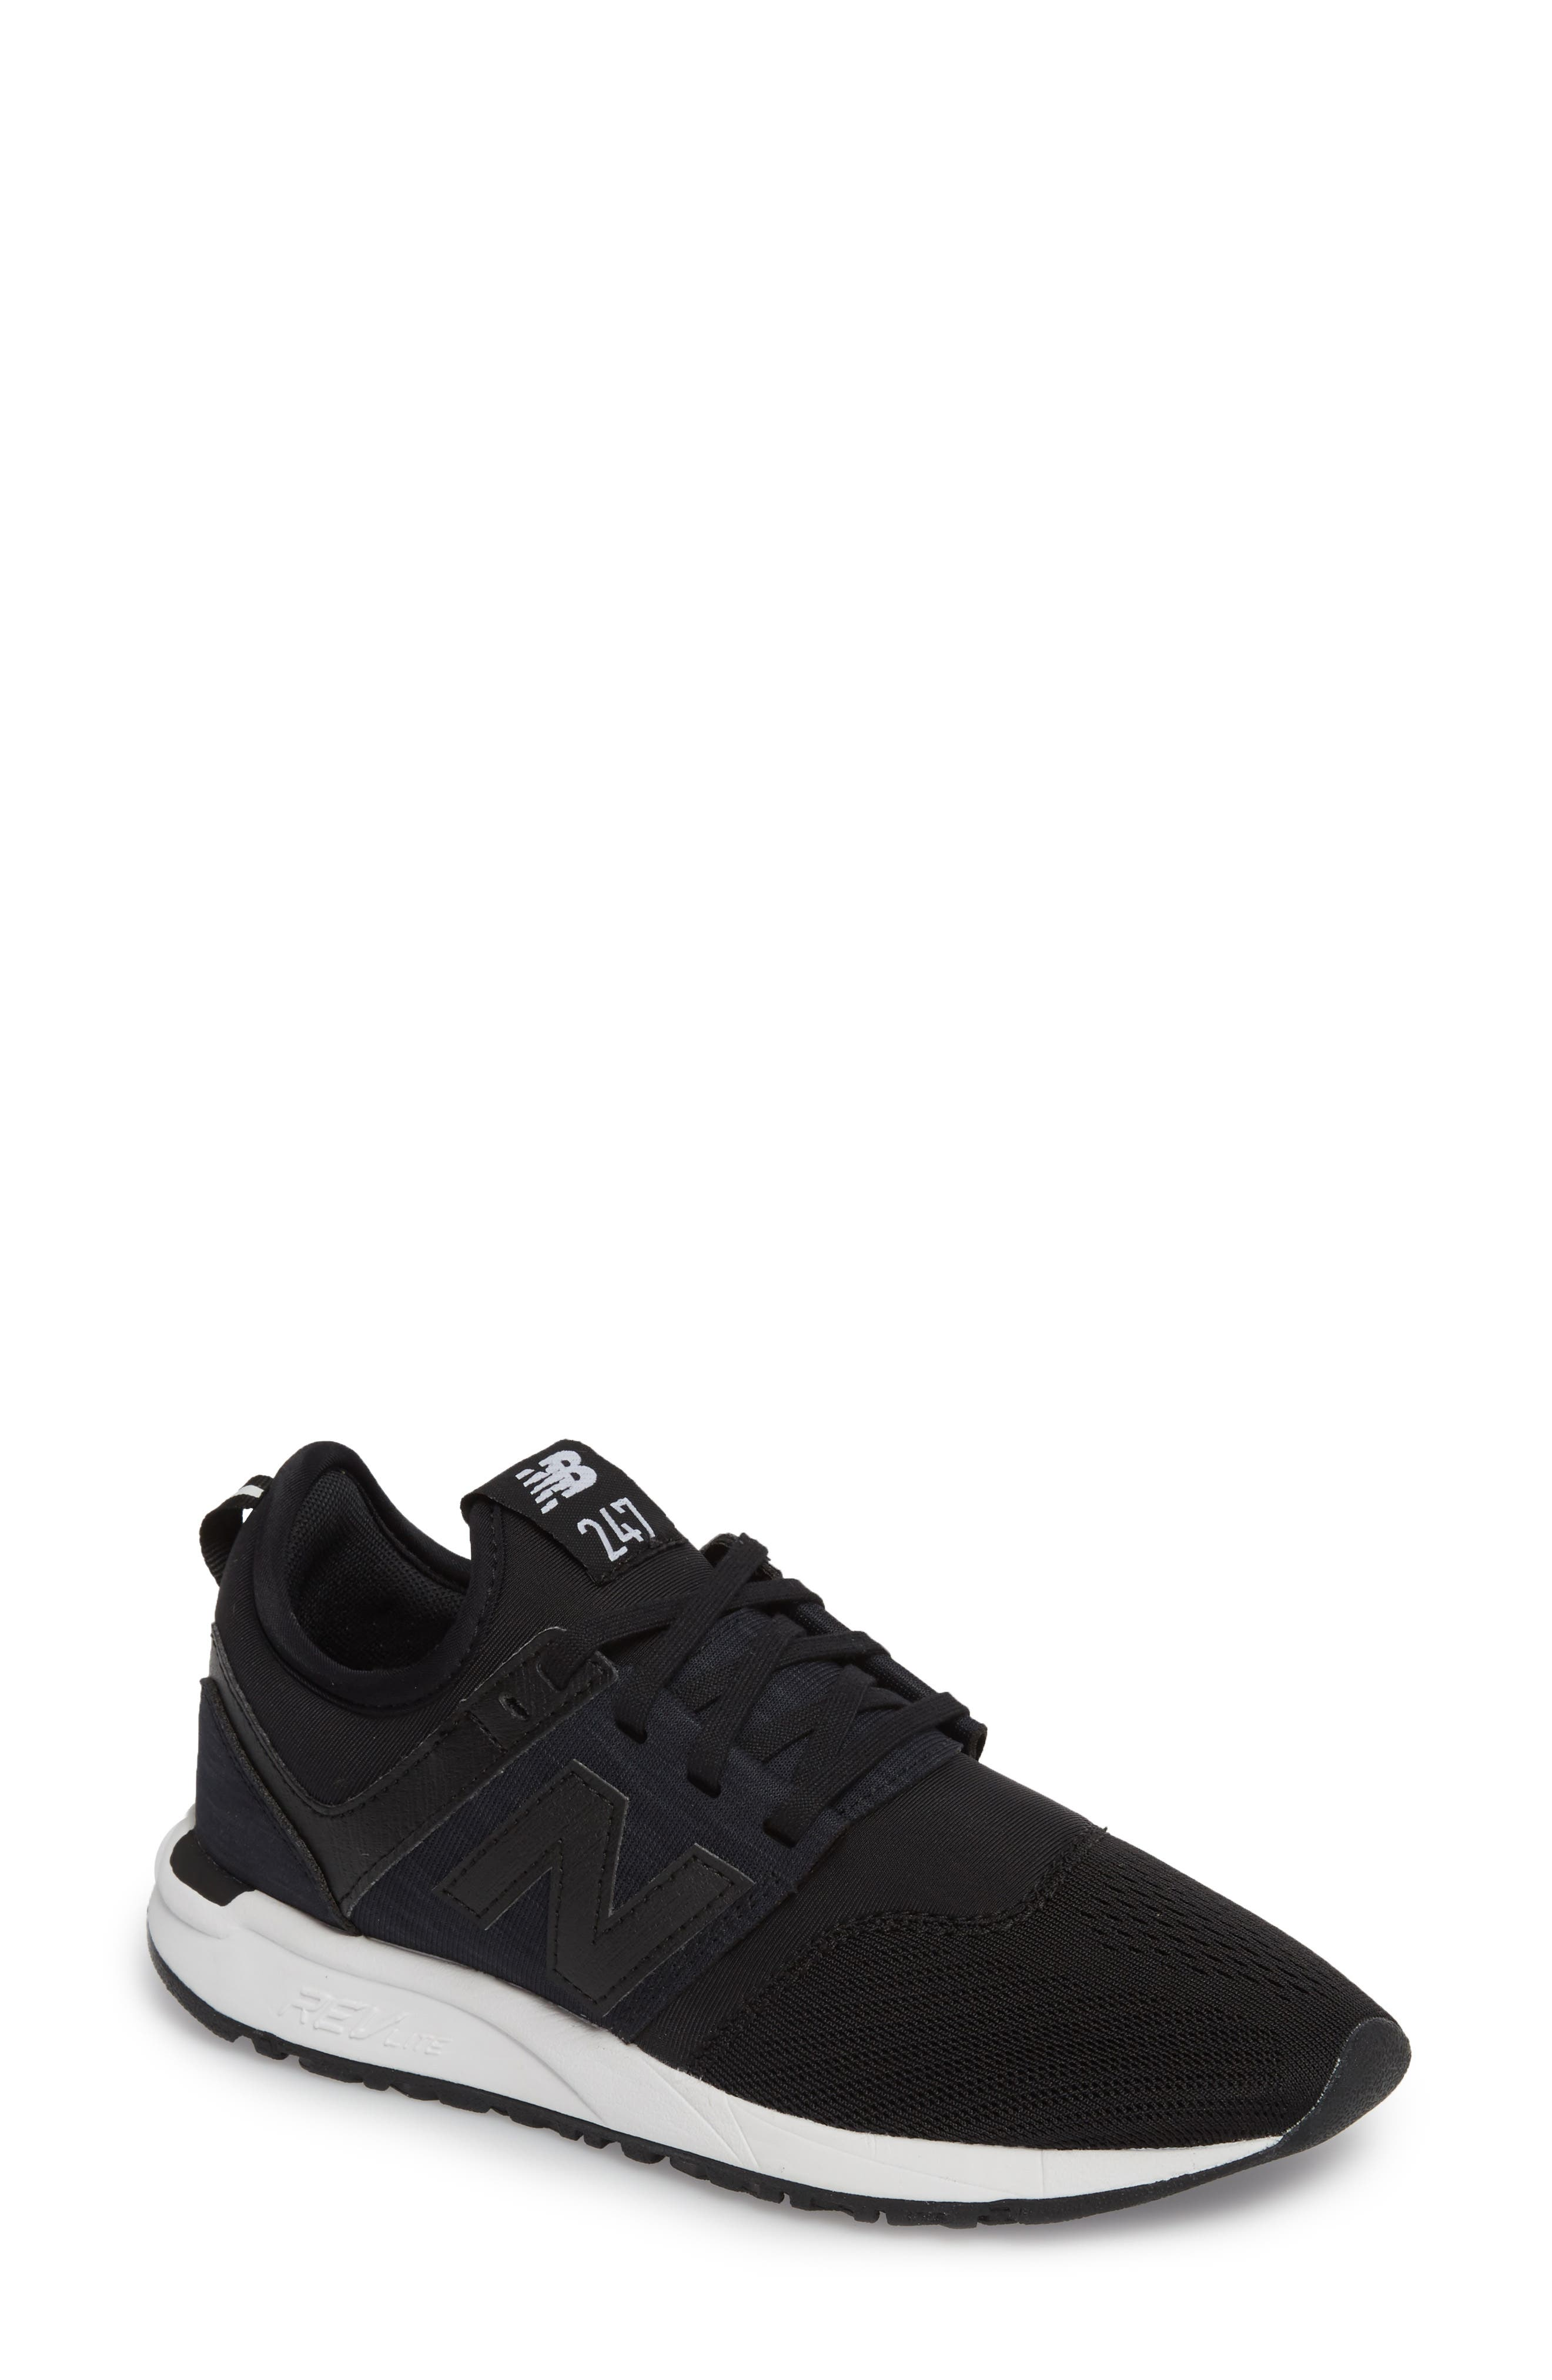 247 Classic Sneaker,                             Main thumbnail 1, color,                             Black